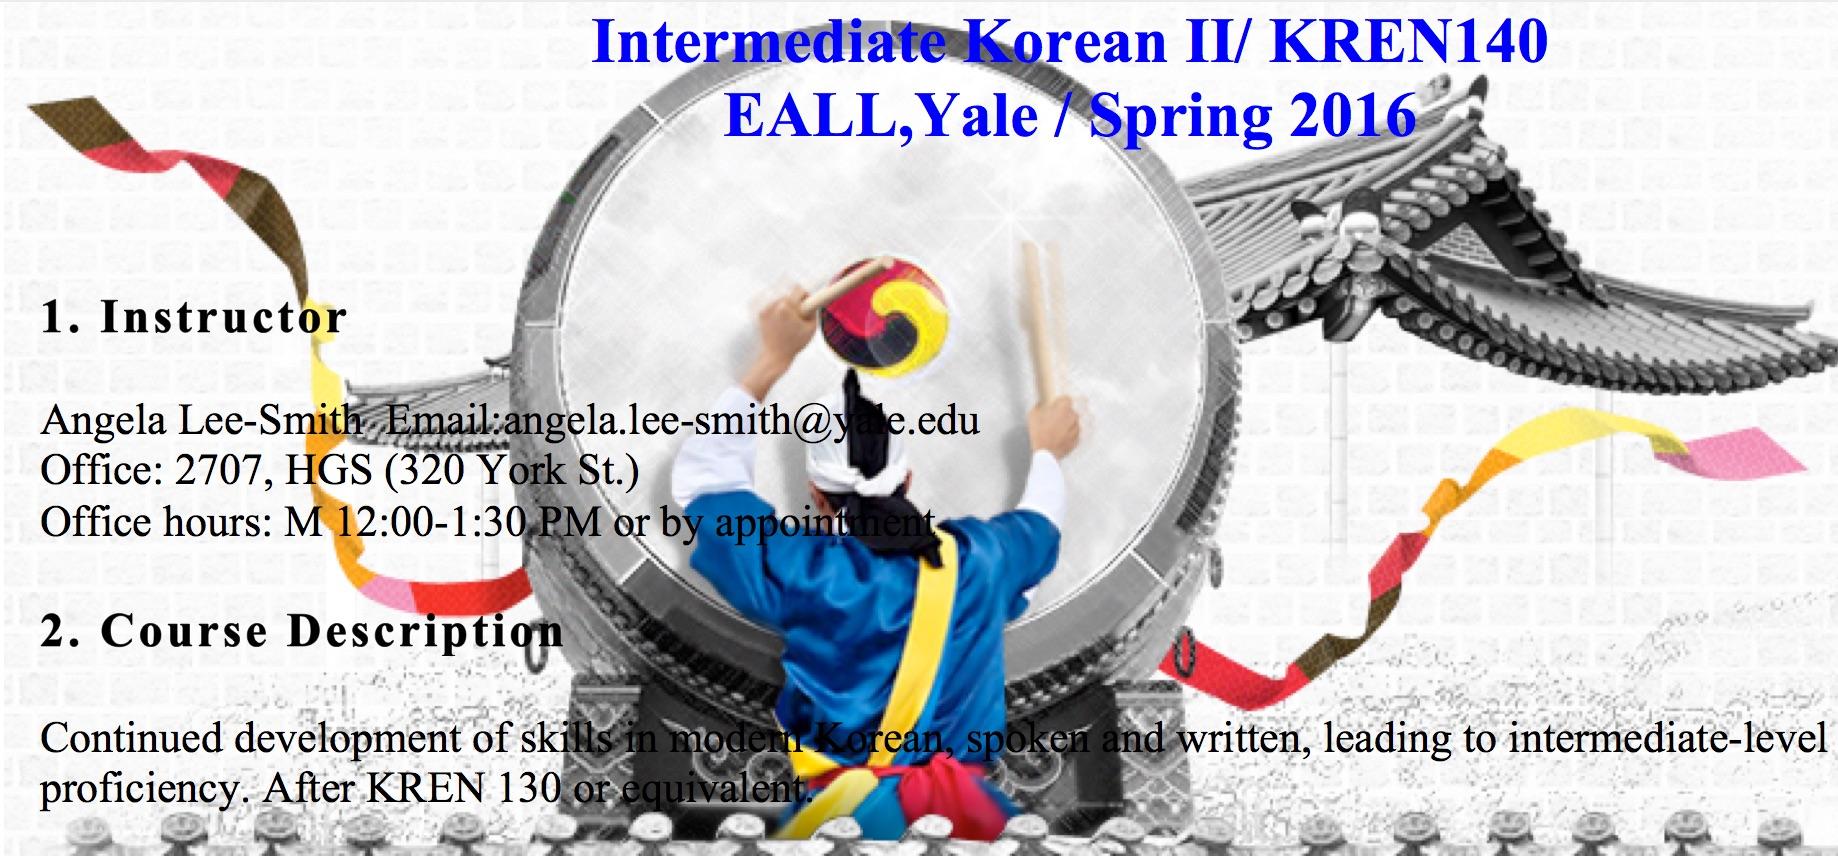 K140 image